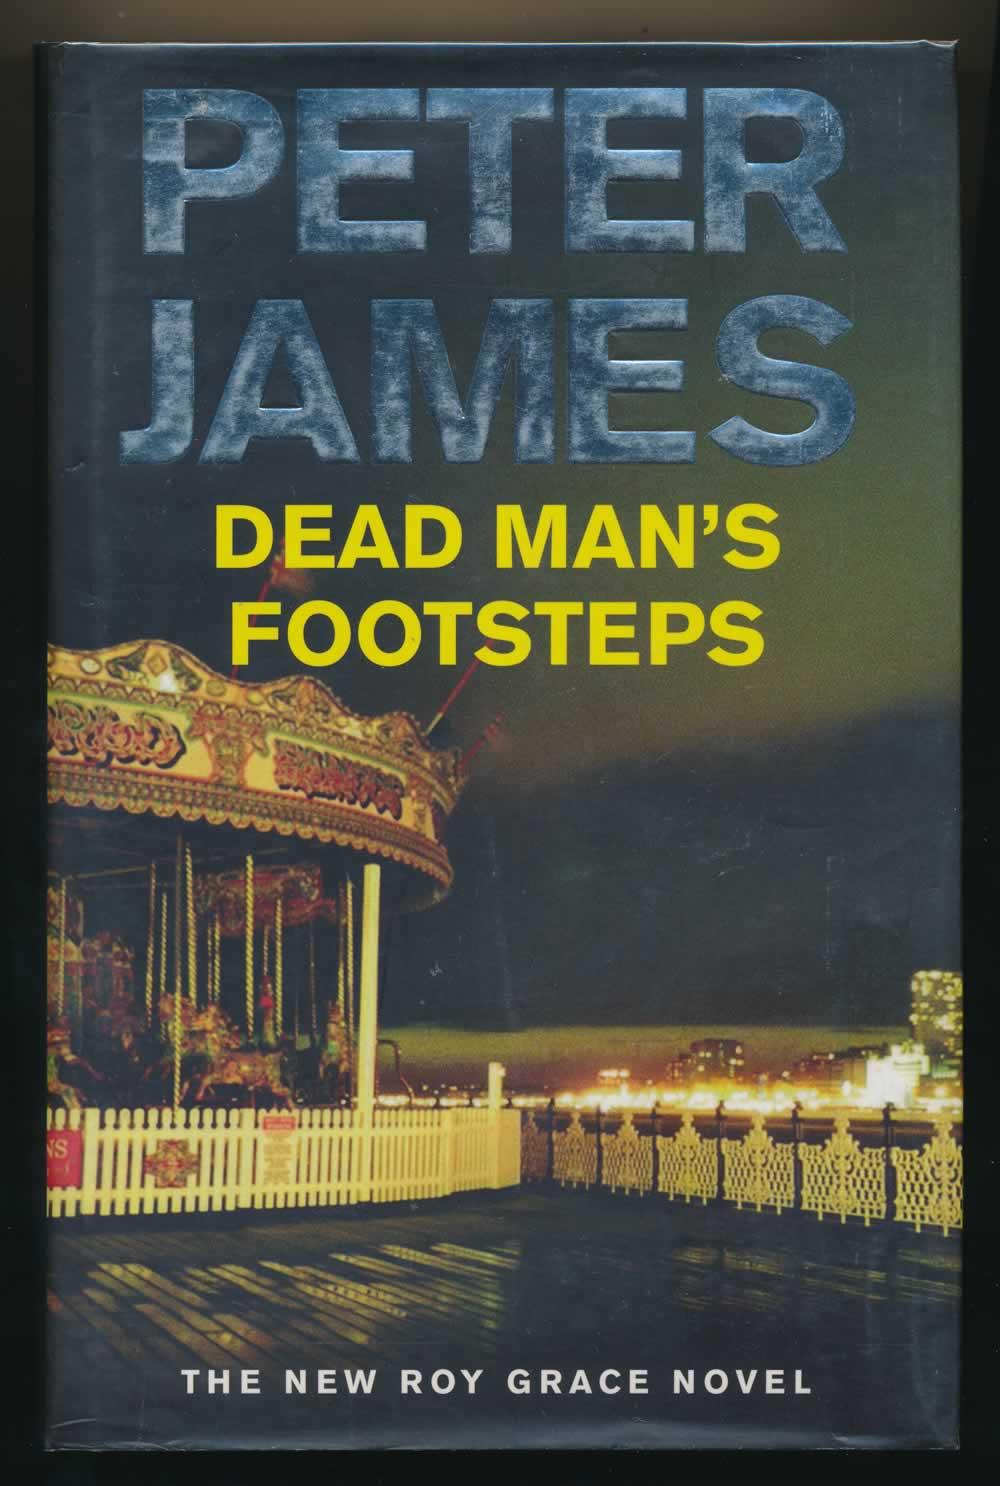 Dead man's footsteps